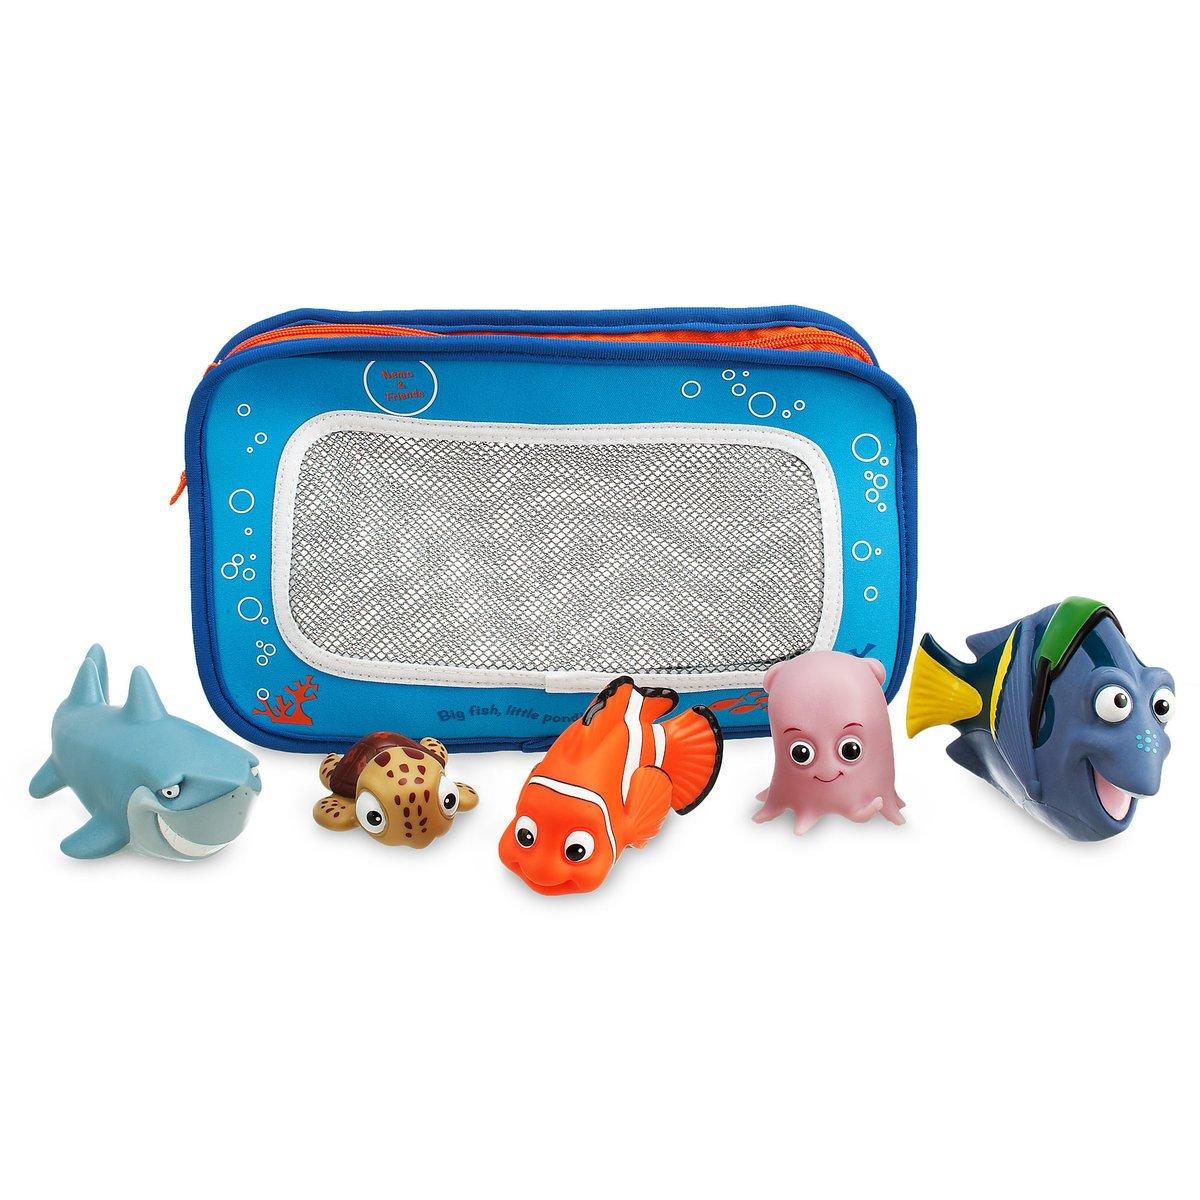 Disney Finding Nemo Bath Toys for Baby   B00EPQUXT8